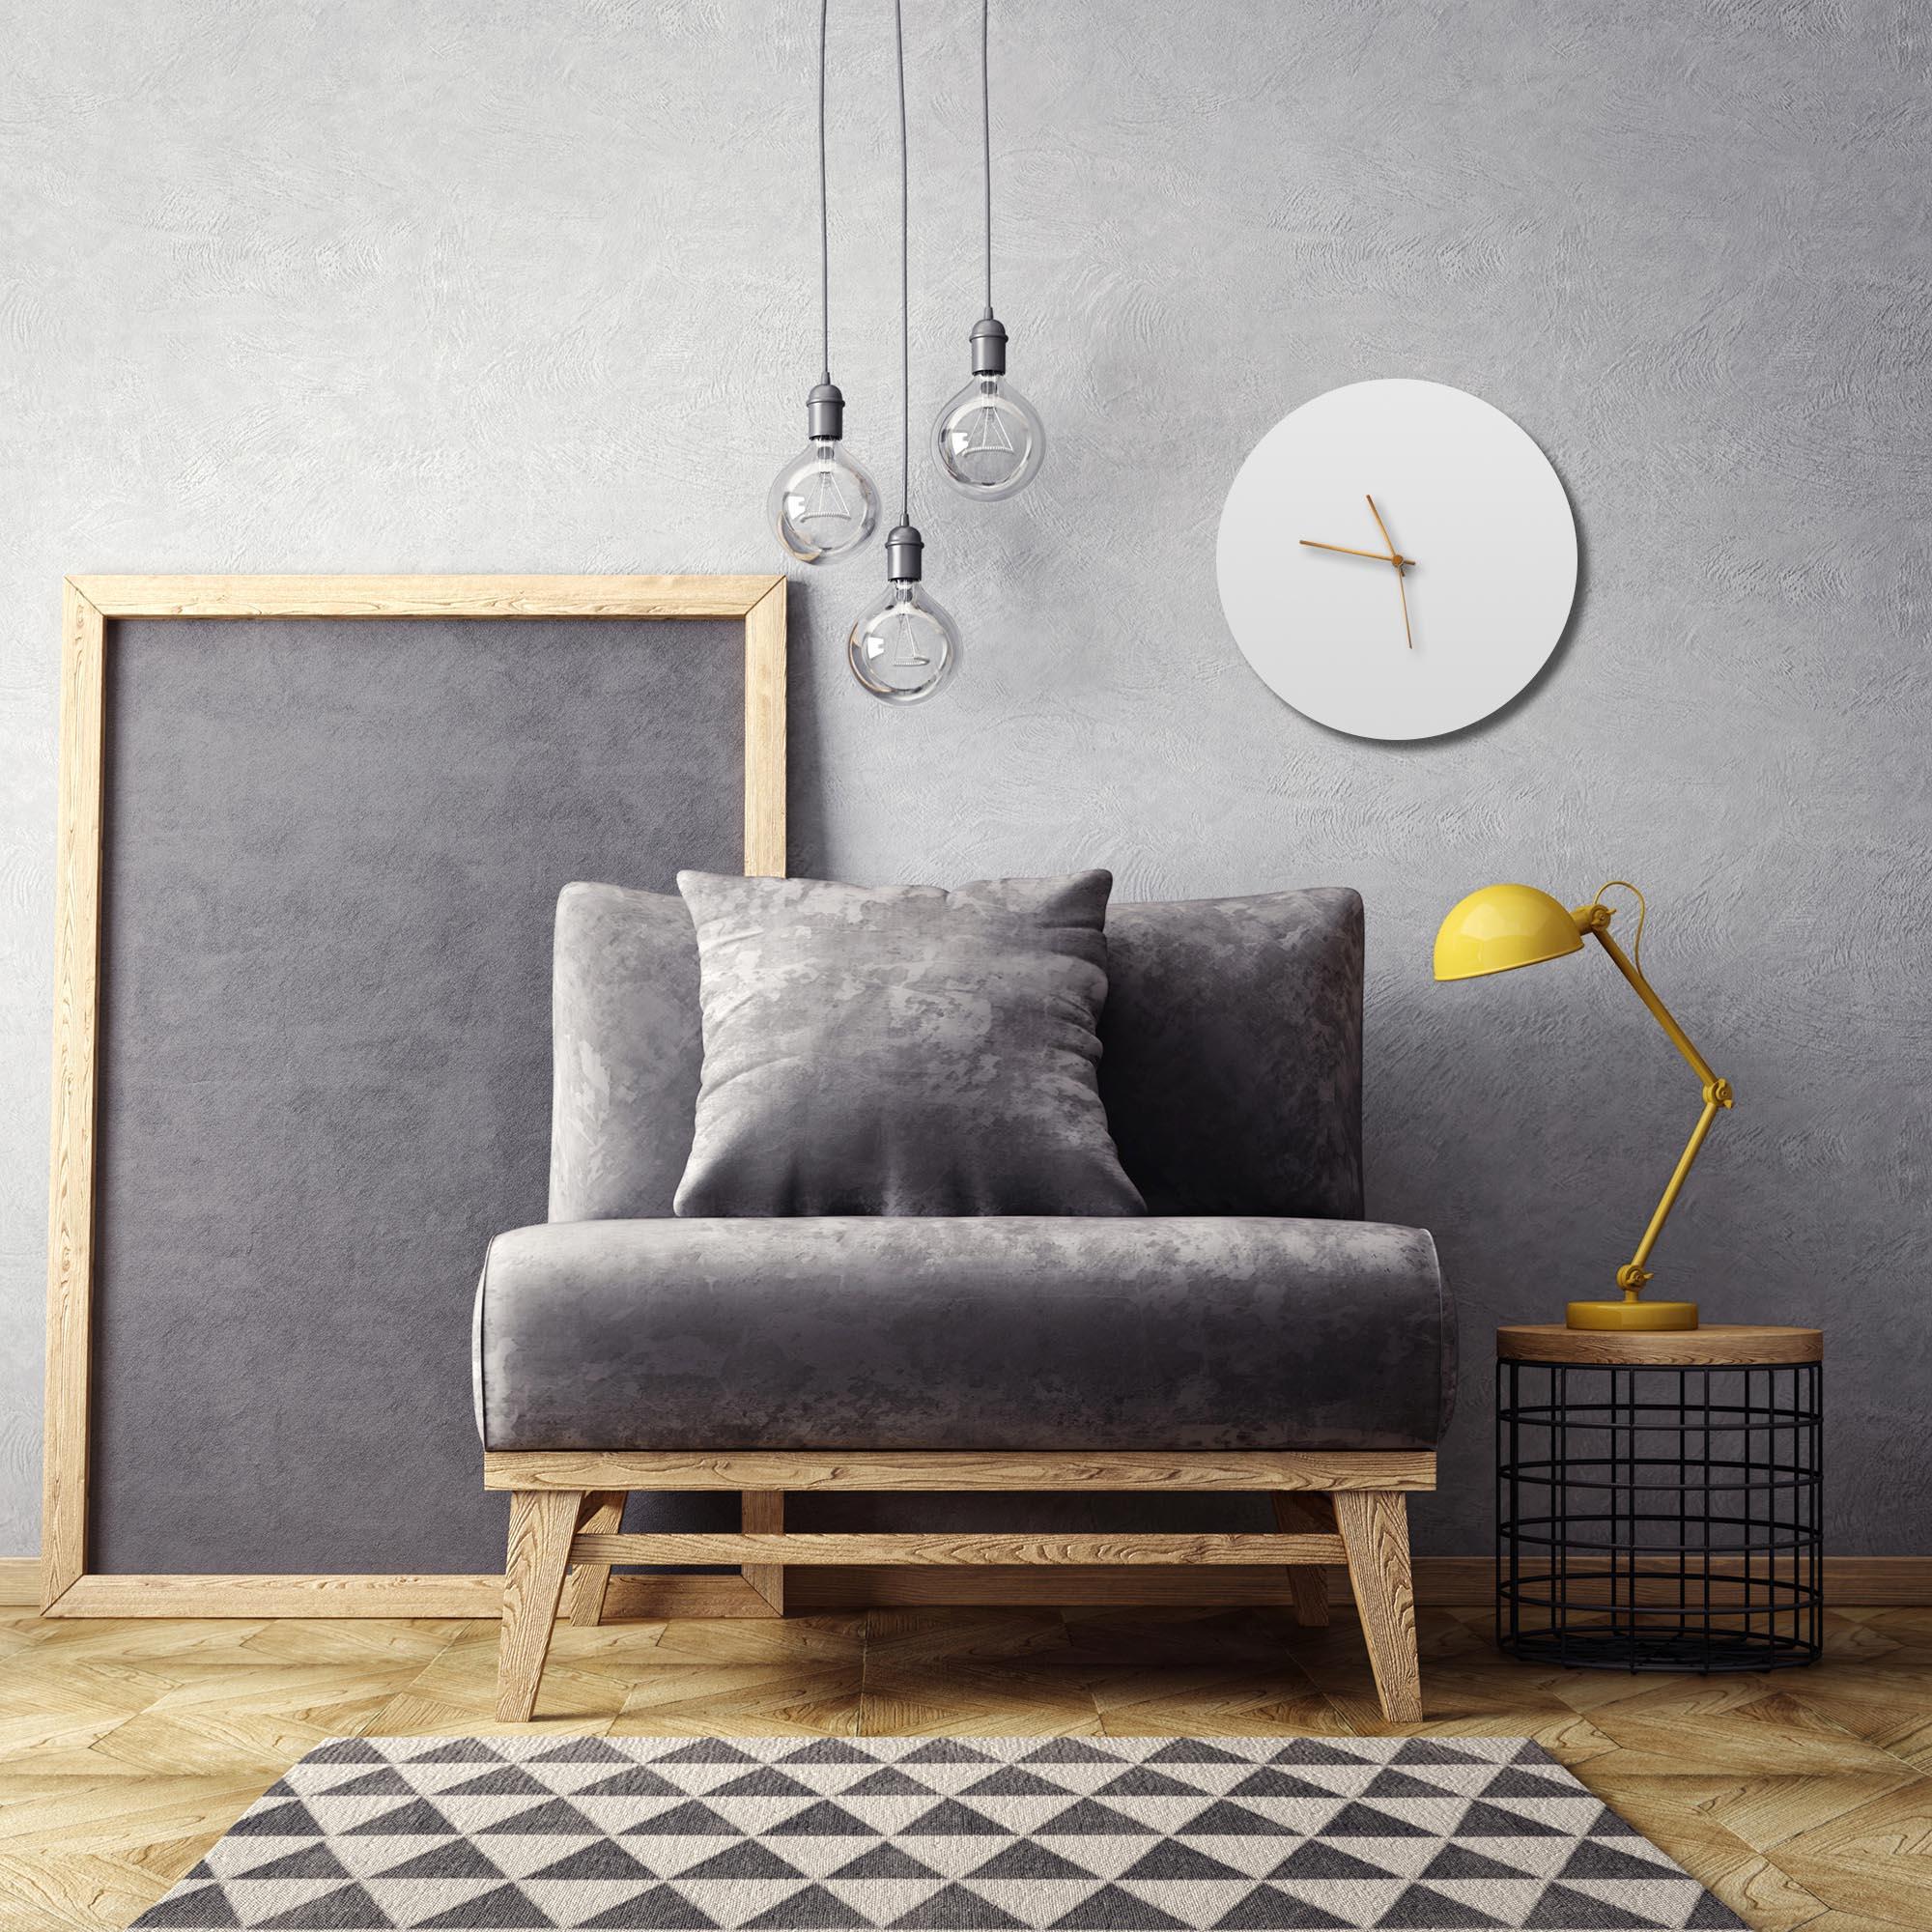 Whiteout Bronze Circle Clock - Lifestyle View